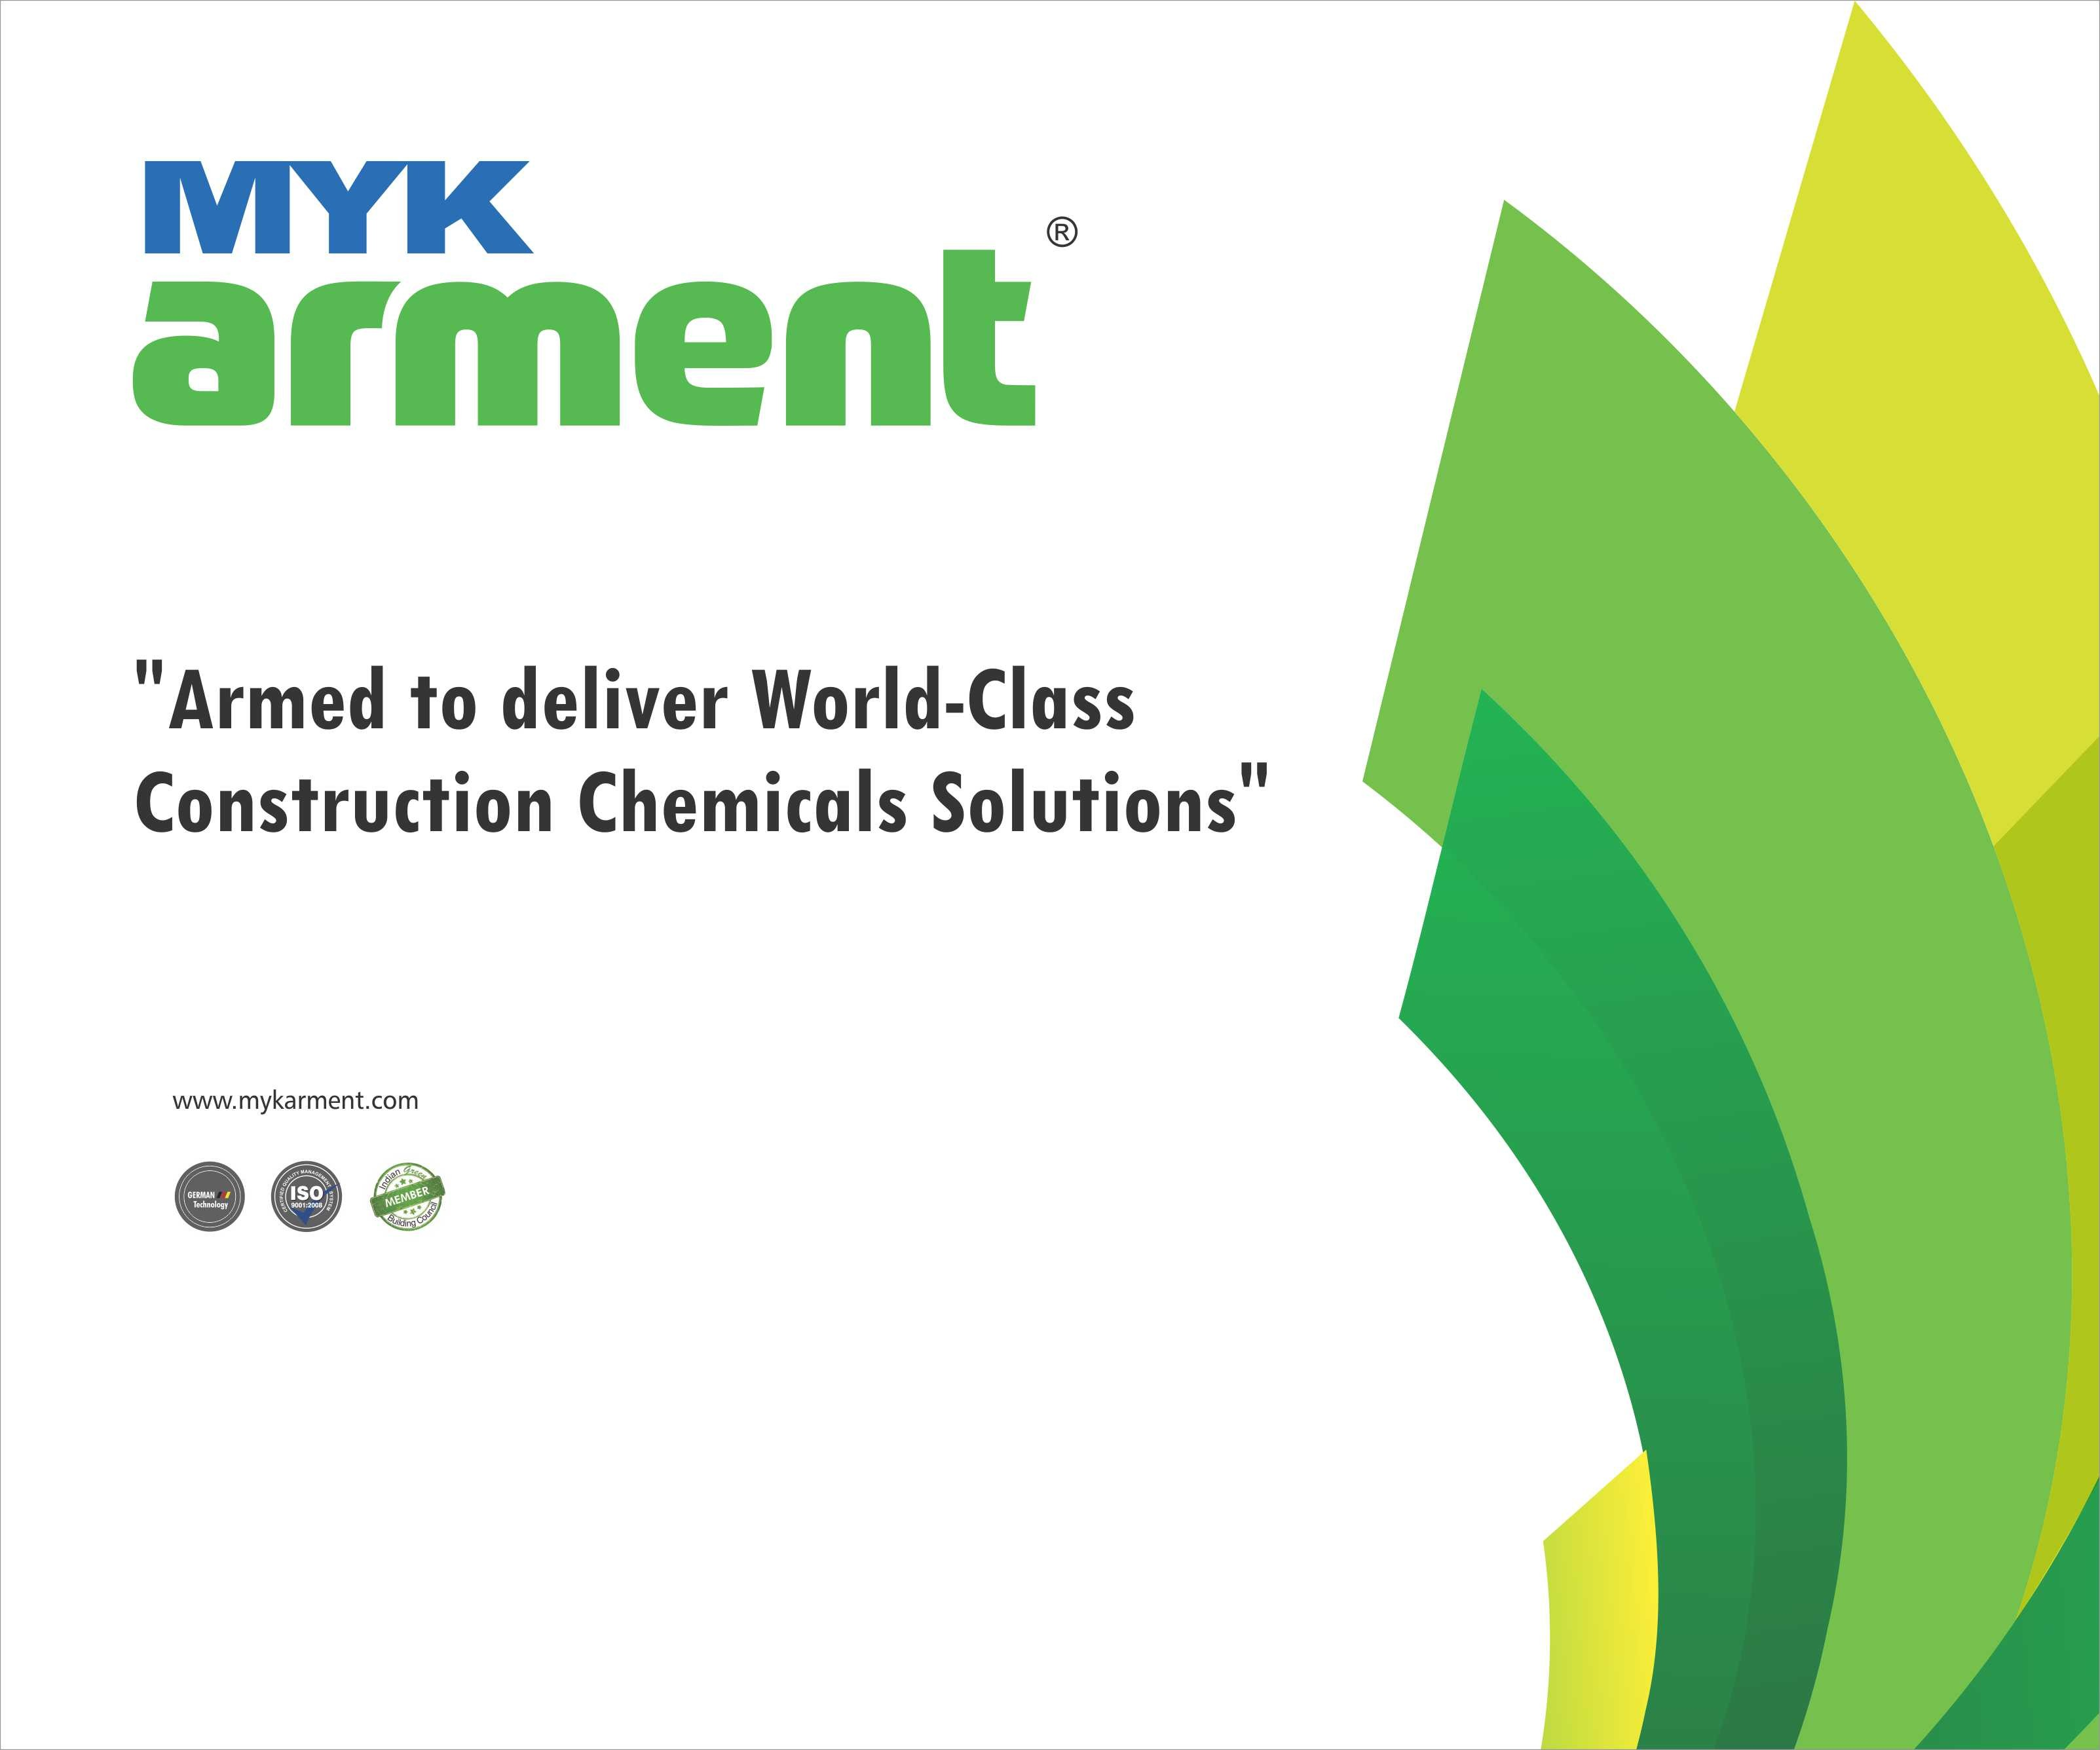 MYK ARMENT - MYK SCHOMBURG INDIA P. LTD - CONSTRUCTION CHEMICALS